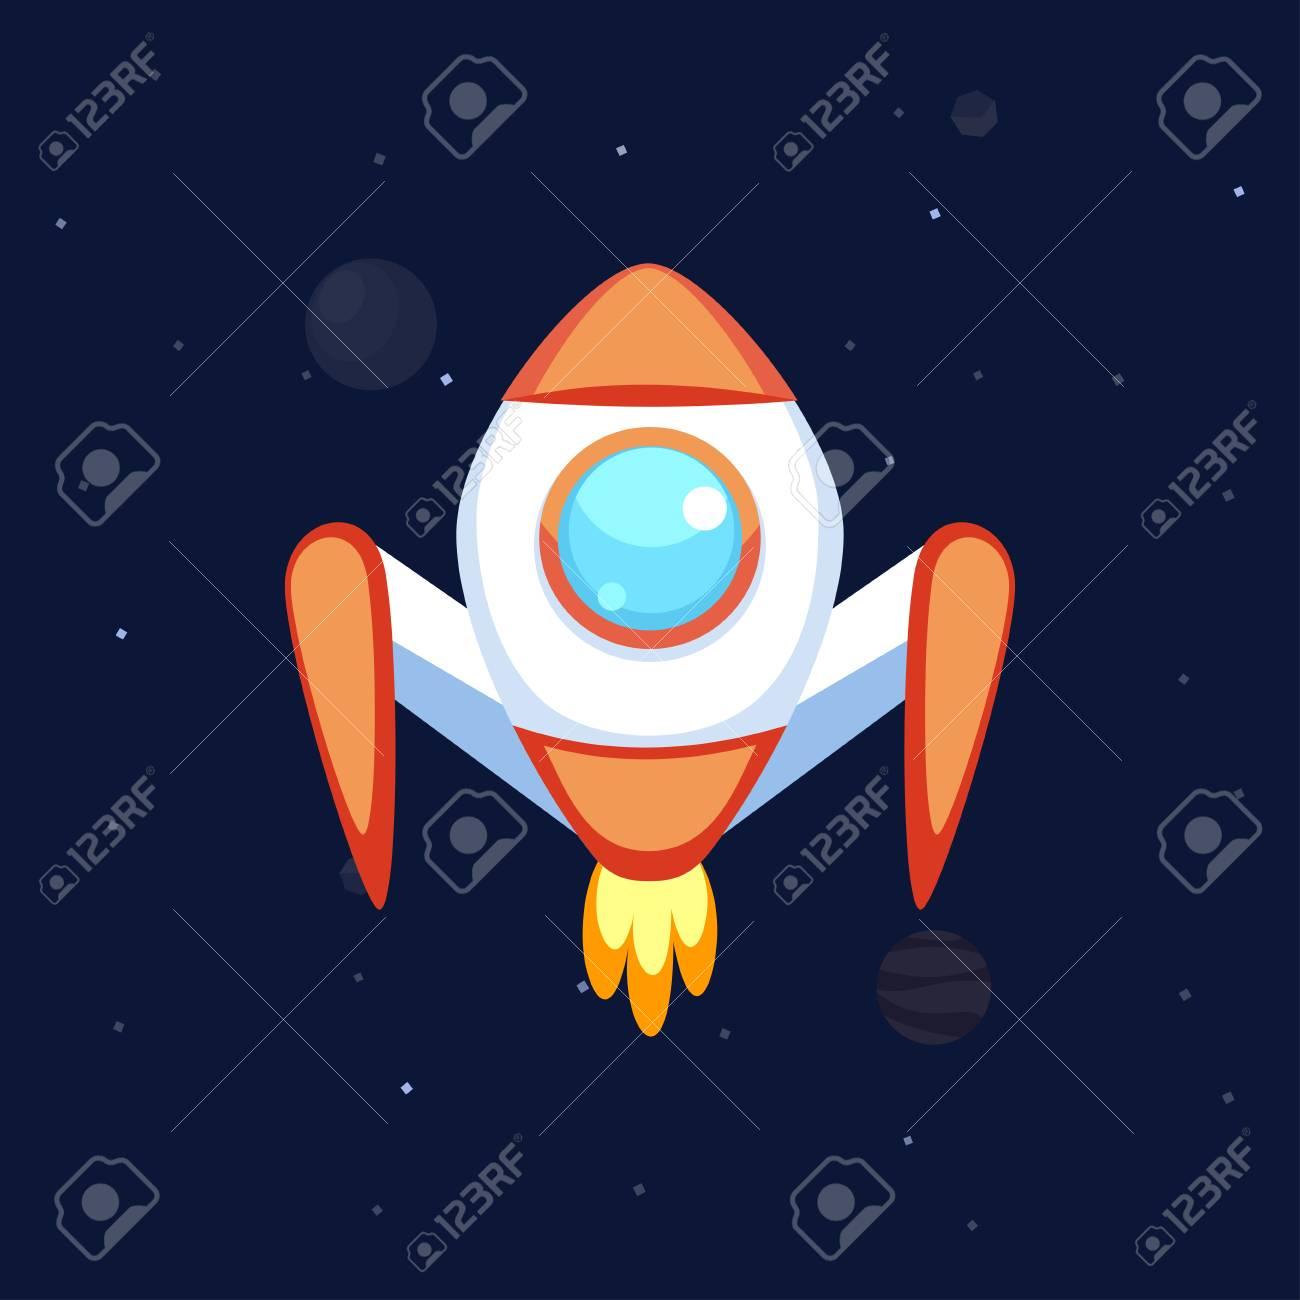 Rocket icons - 69017557